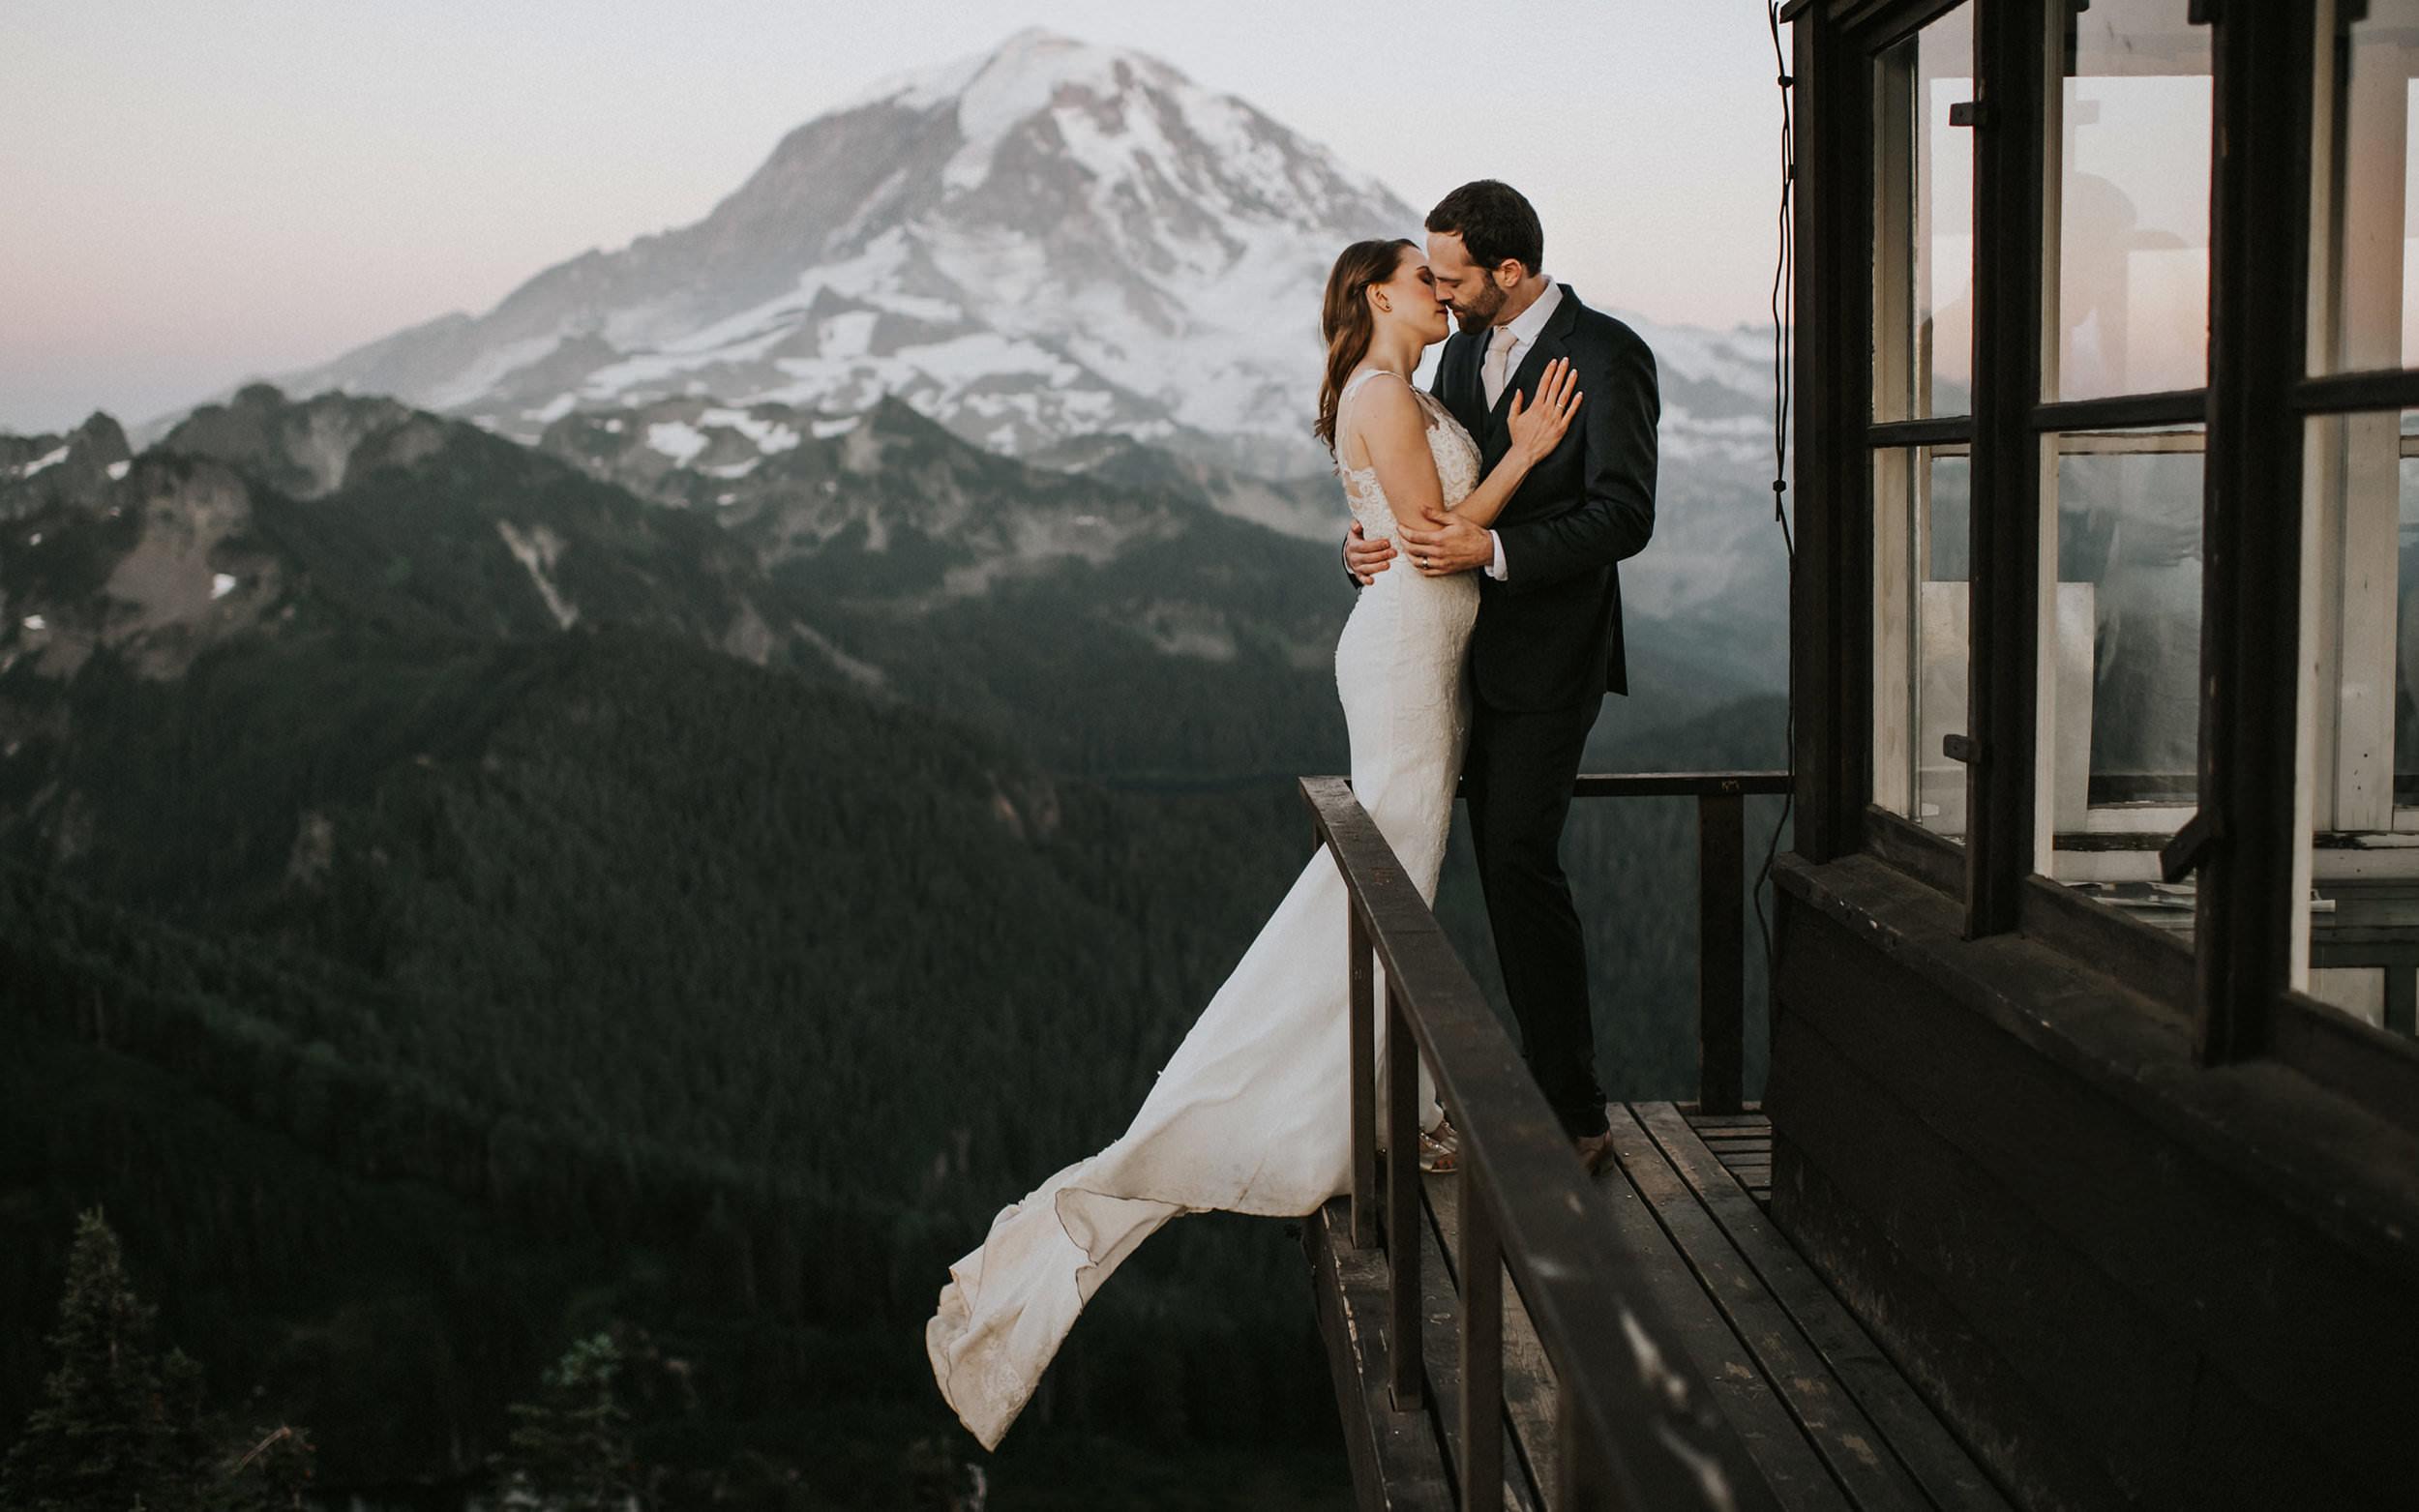 Mount Rainier National Park Adventure Elopement Wedding